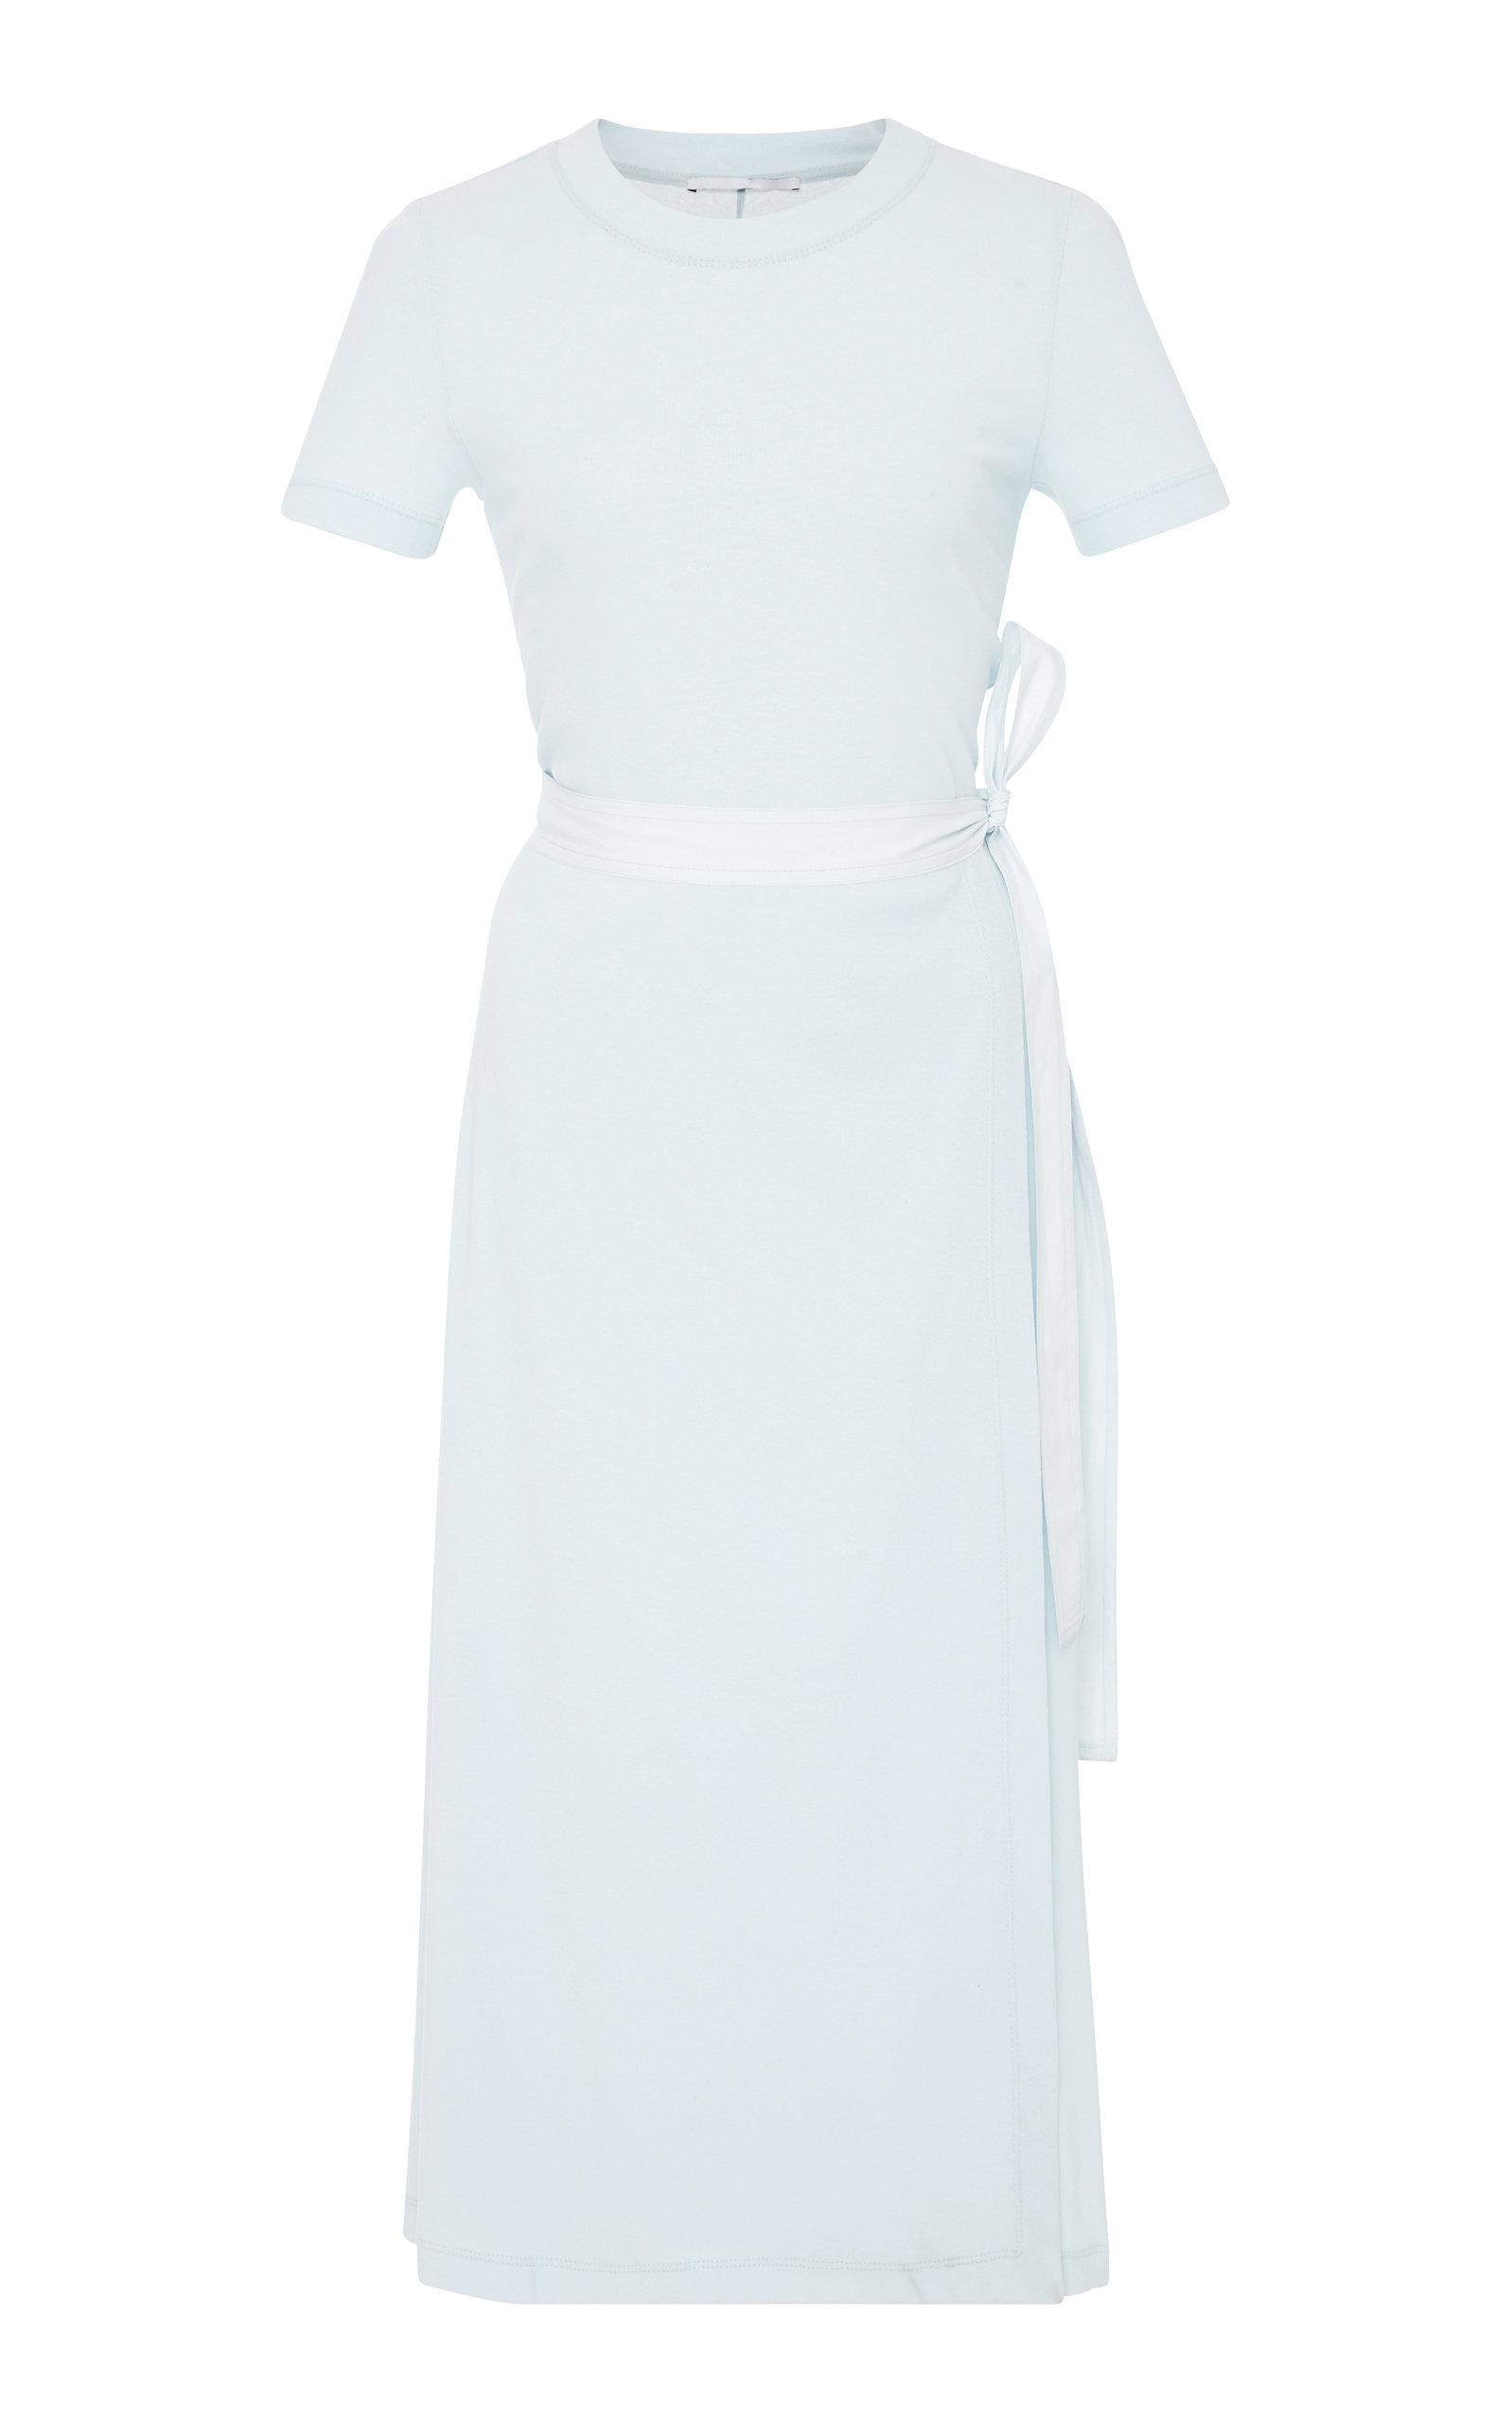 Rib Knit Apron Wrap Dress Rosetta Getty bGkAIcjjdf